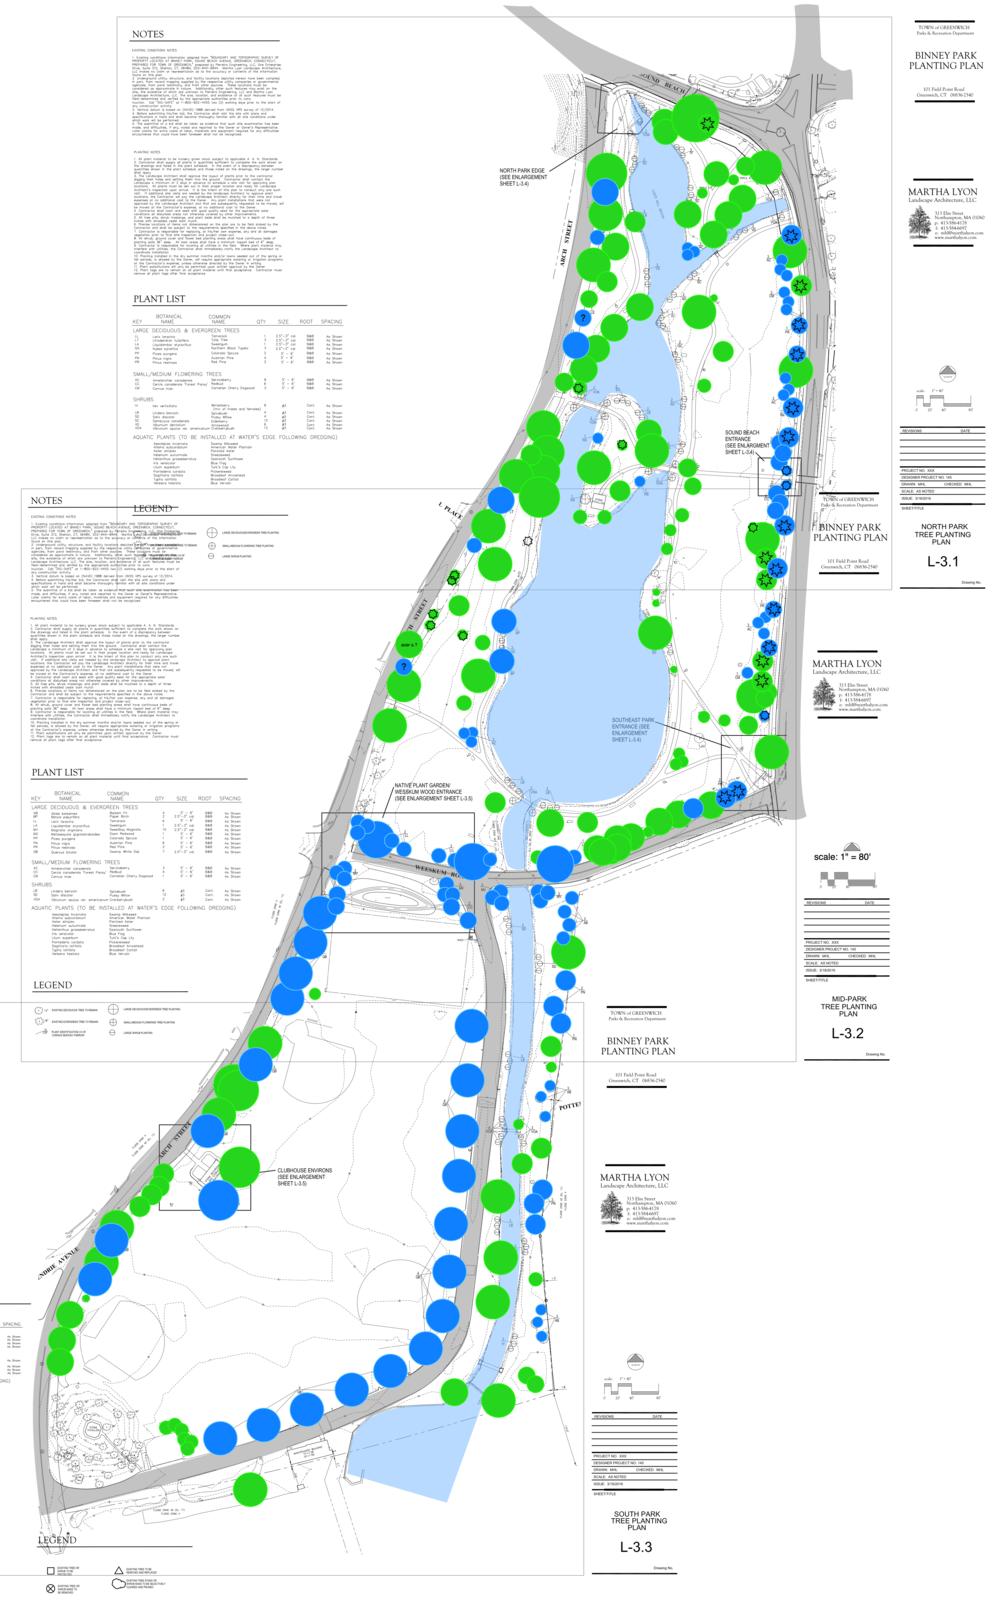 binney park plan mature size.png